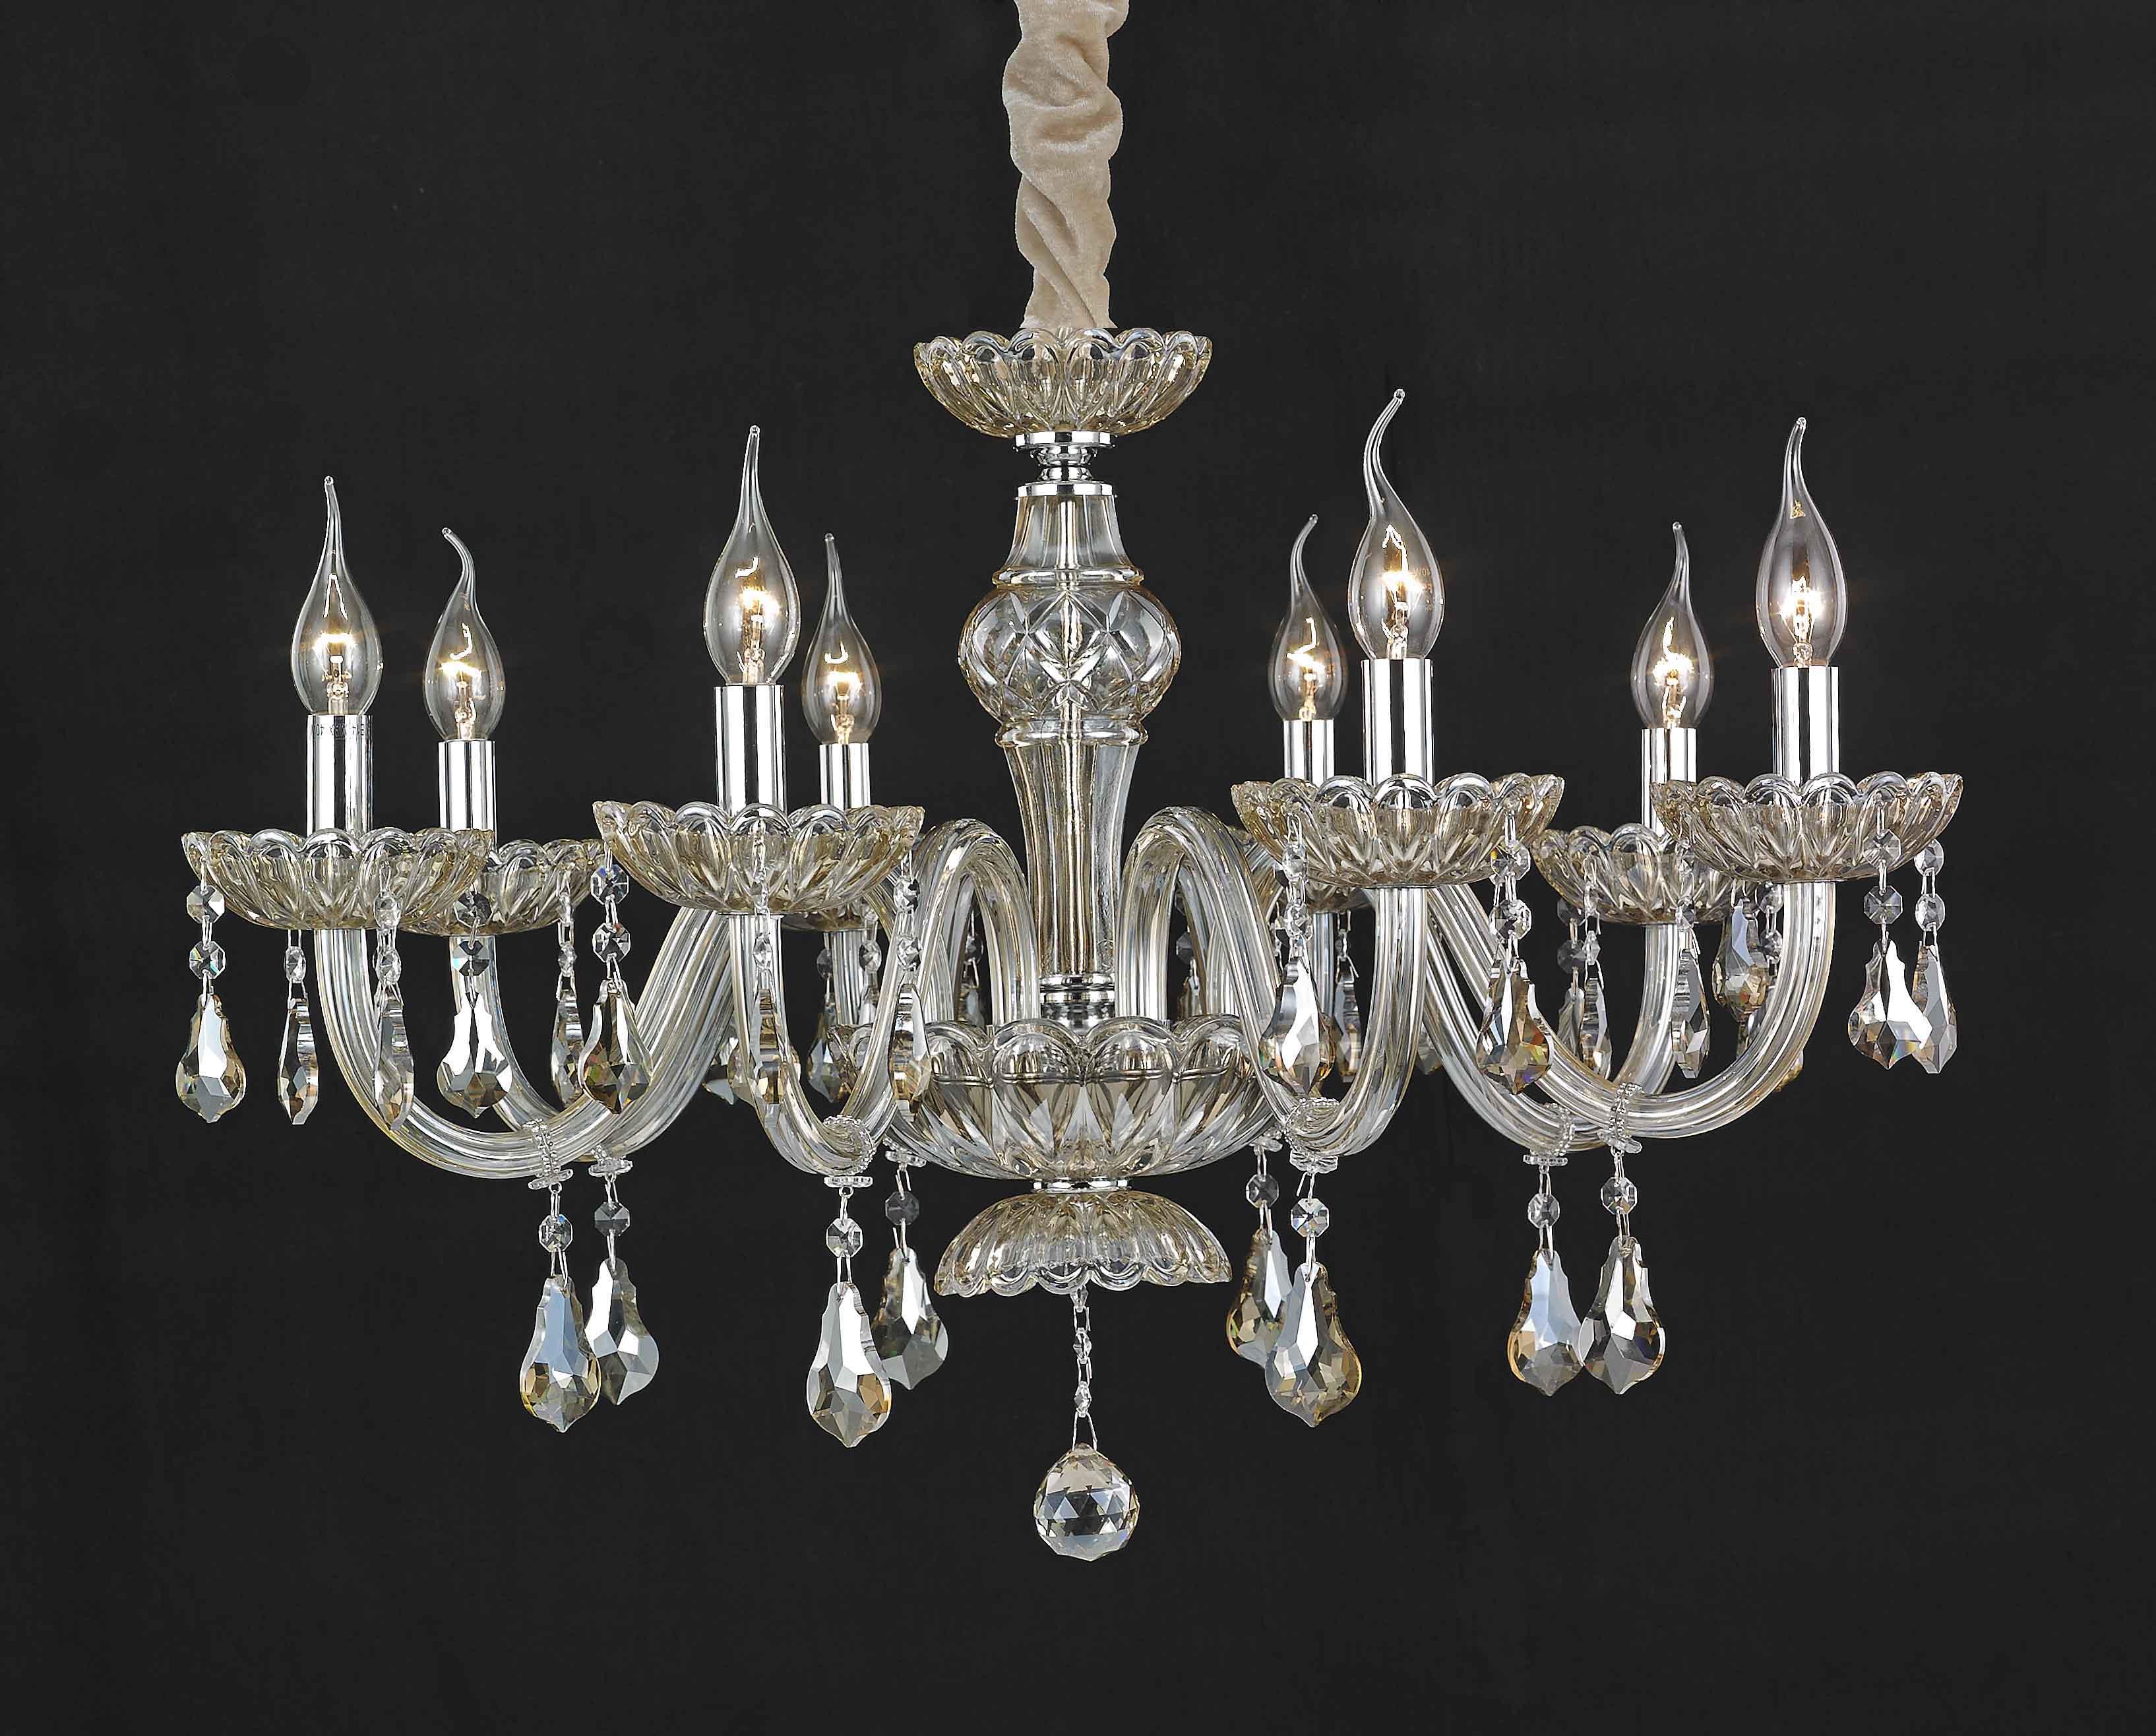 Lampadario Rosa Cristallo : Lampadari a sospensione lampadario da luci lampada